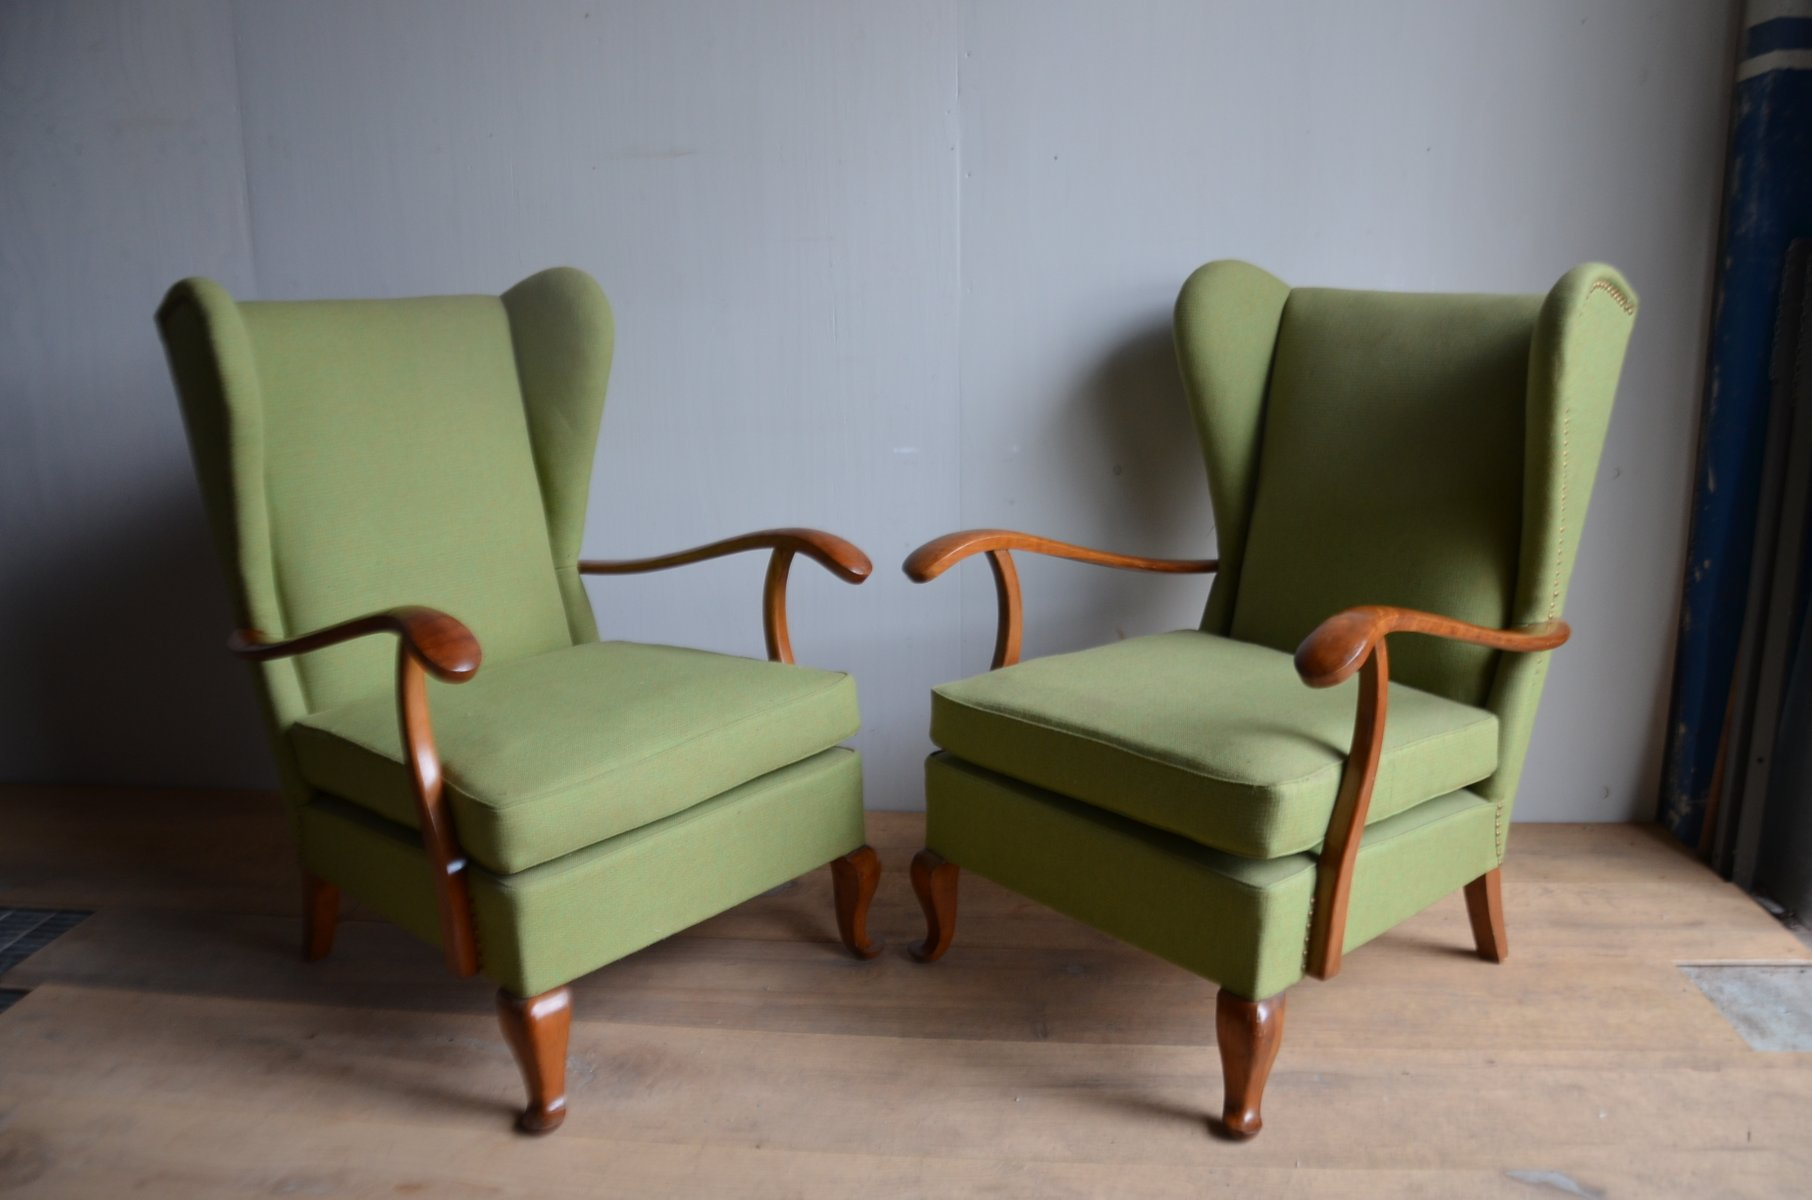 italienische mid century sessel von paolo buffa 1964 2er. Black Bedroom Furniture Sets. Home Design Ideas